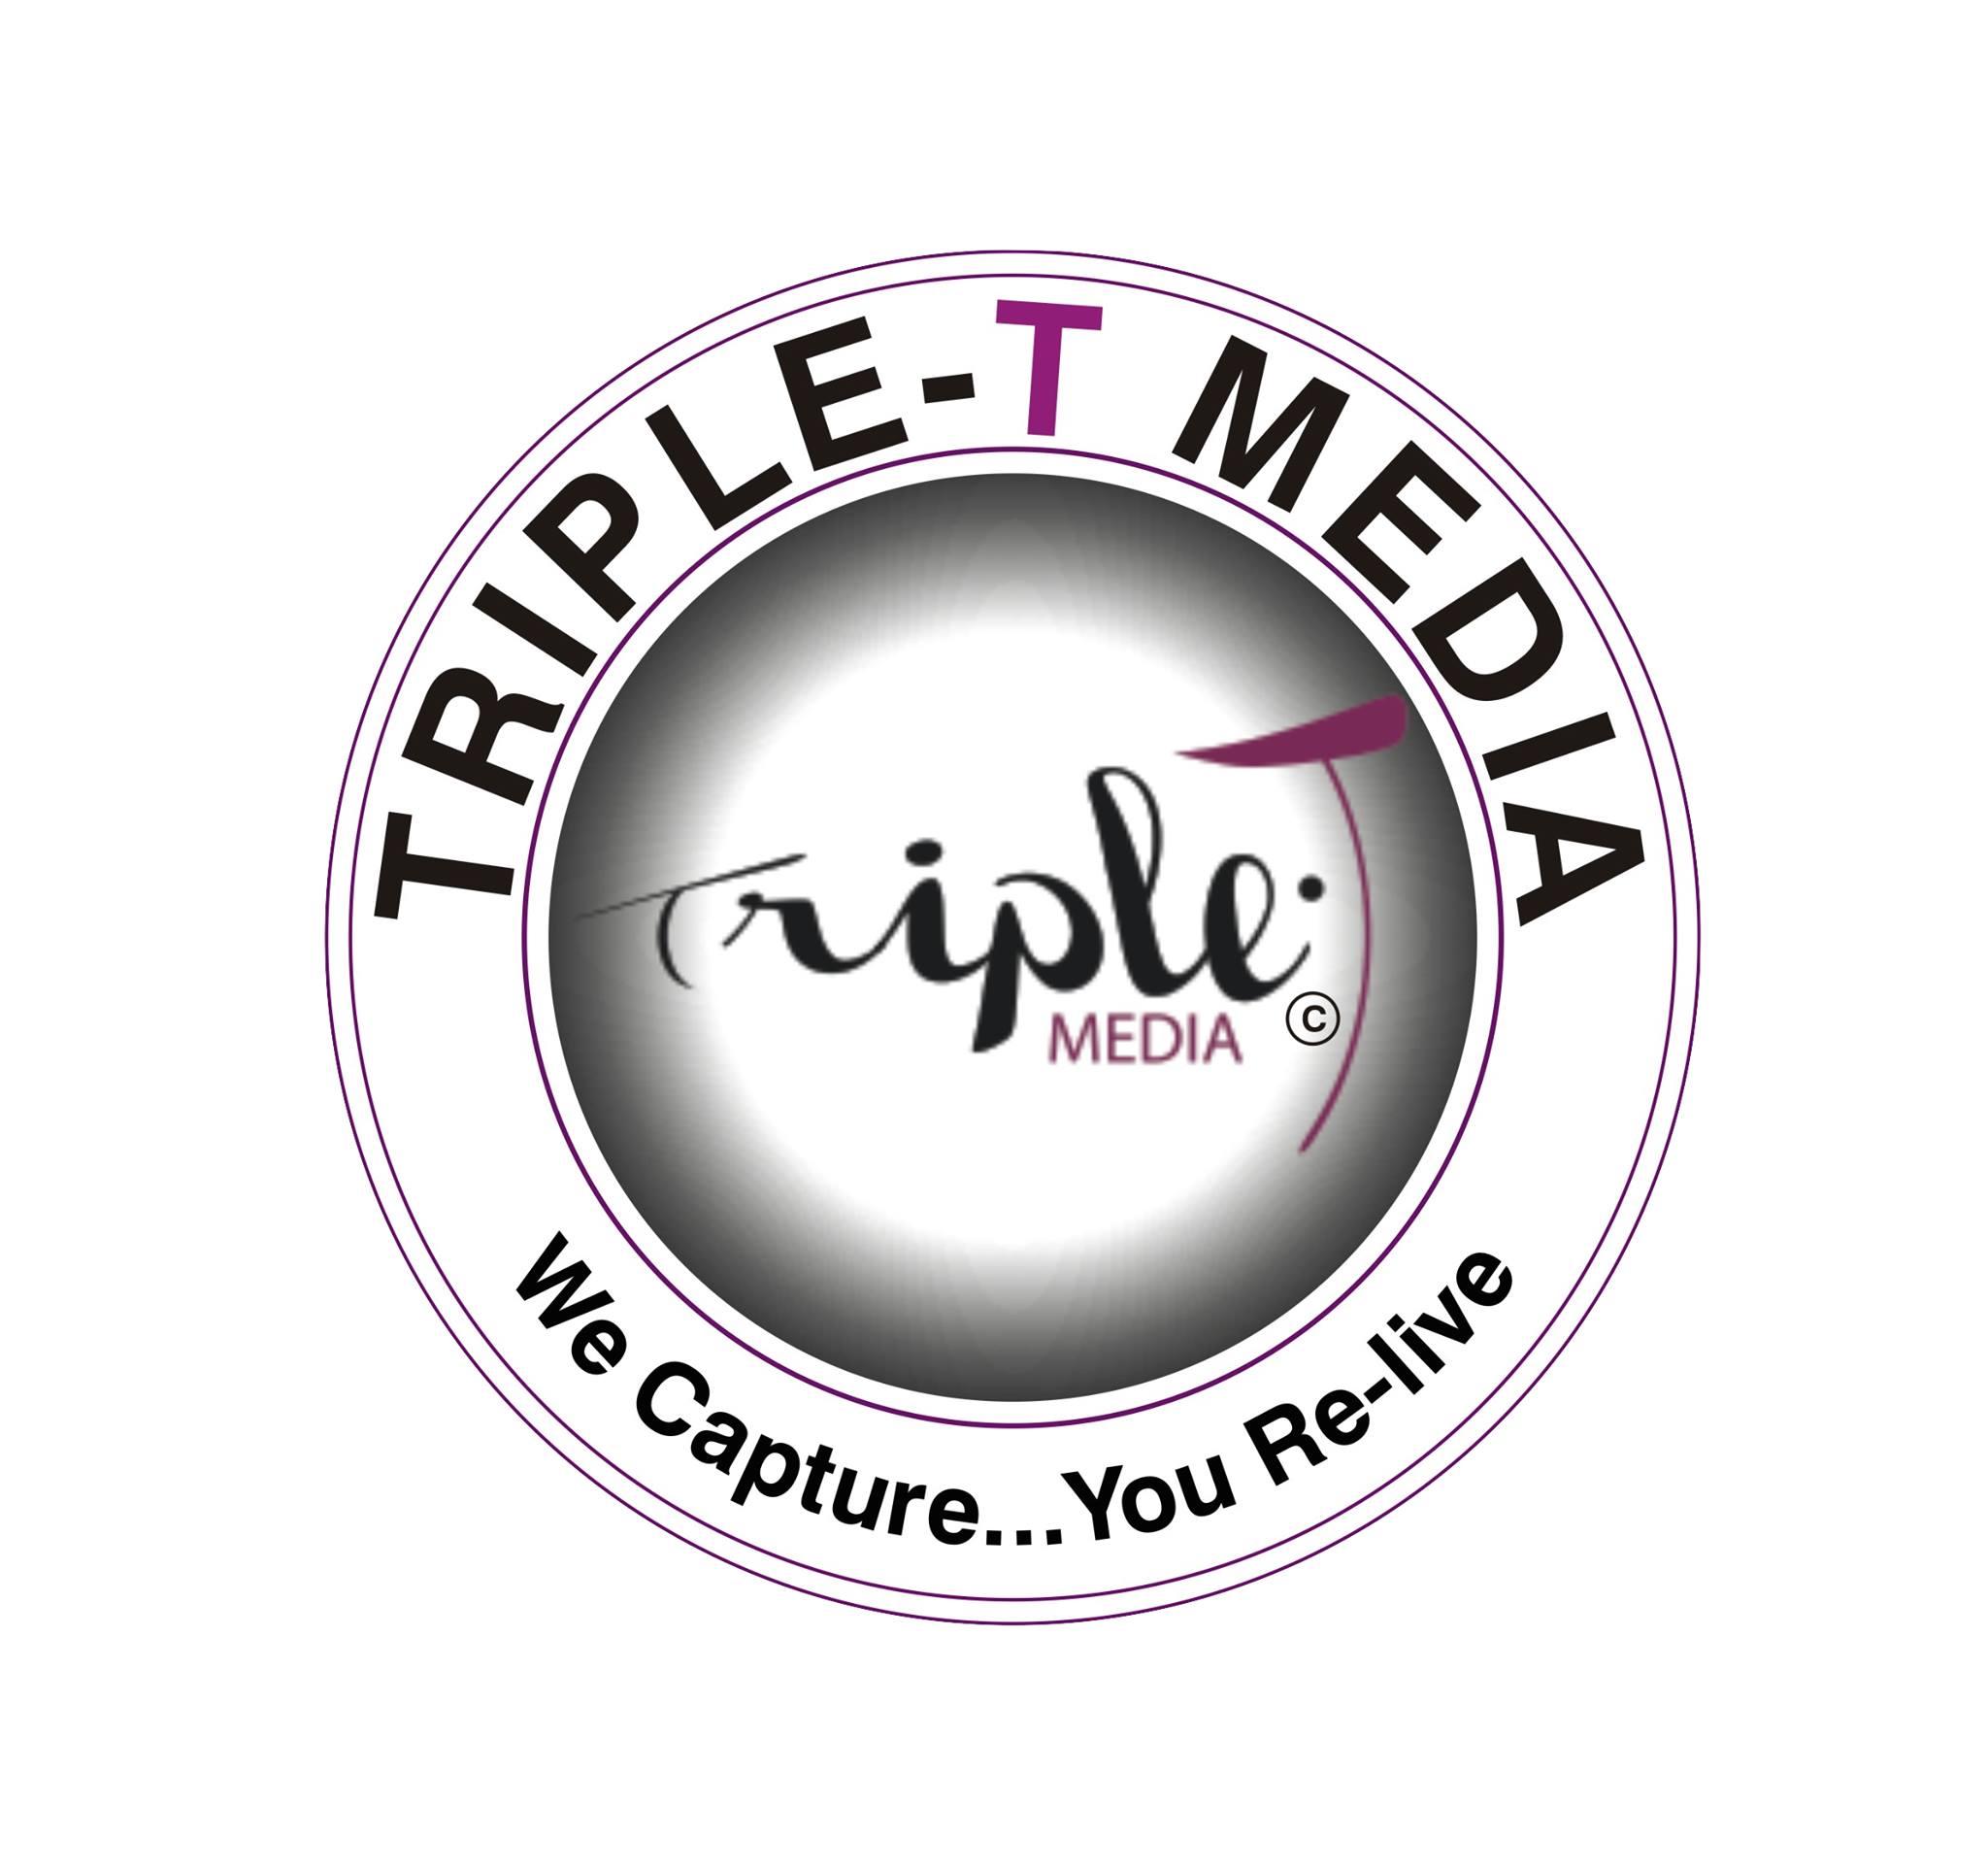 TRIPLE - T MEDIA